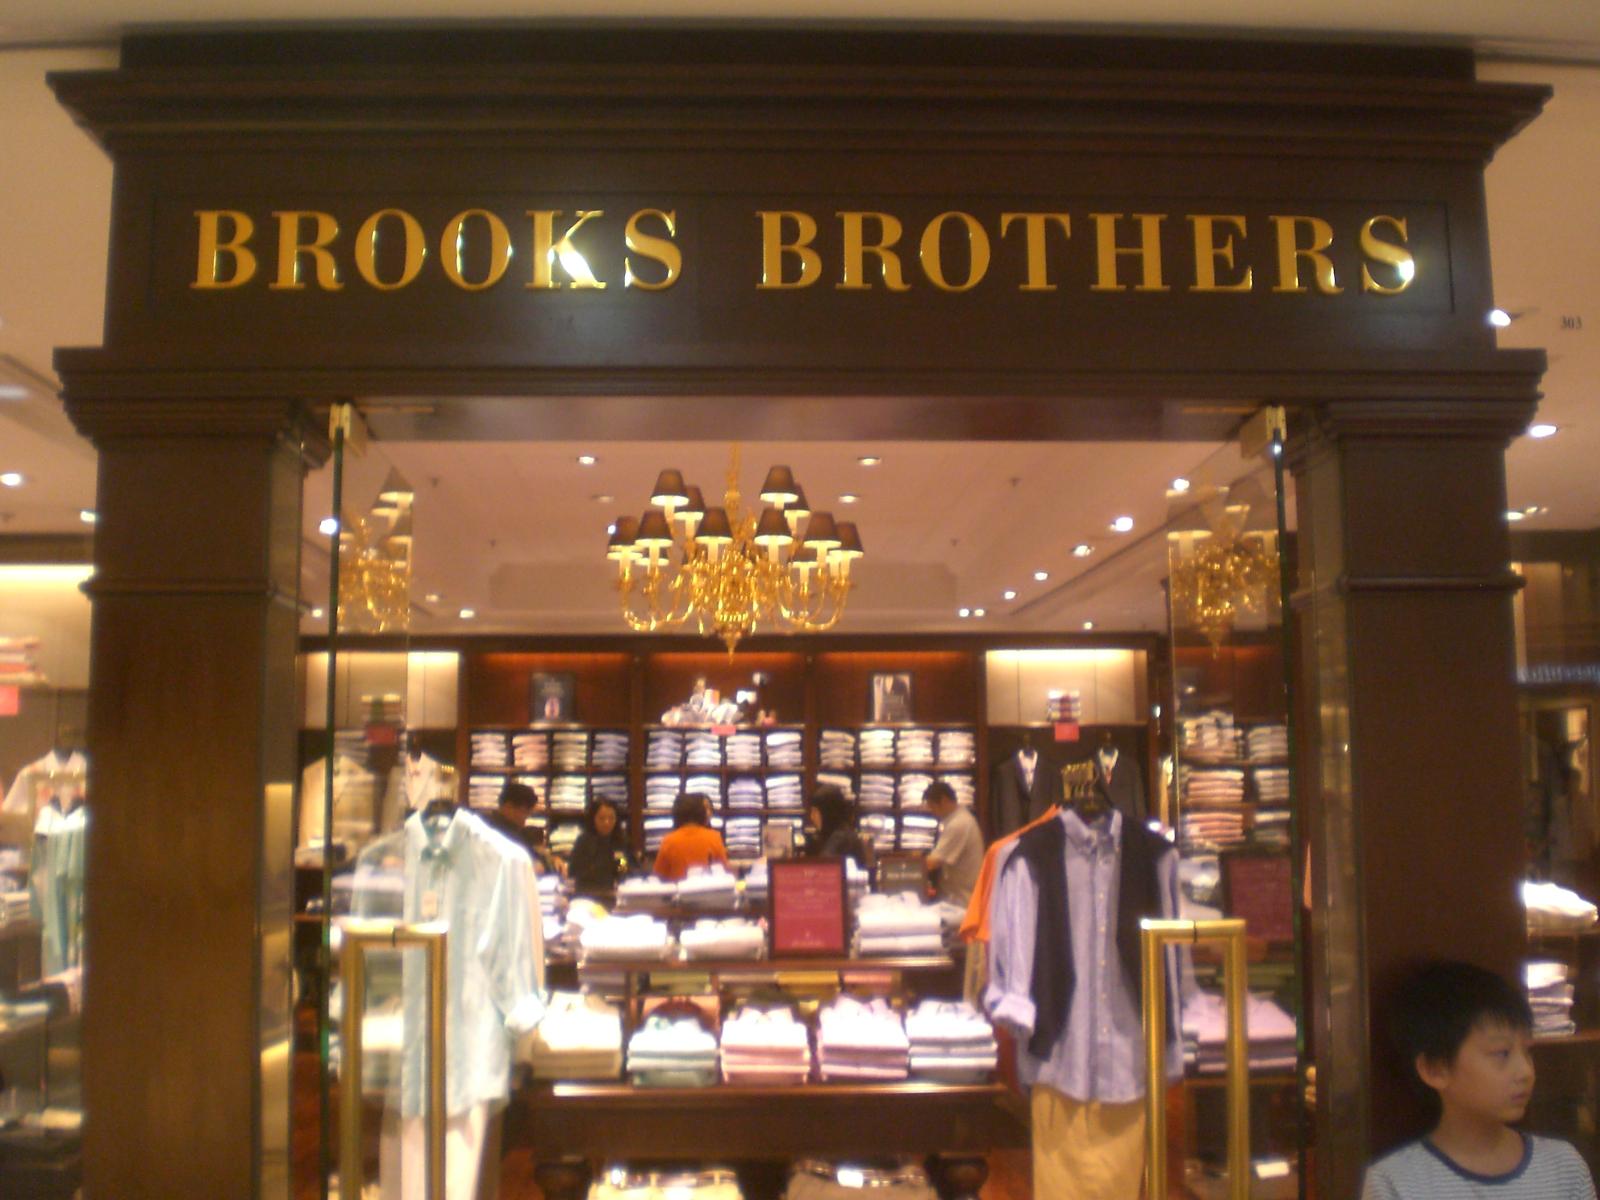 brooks brothers - photo #50